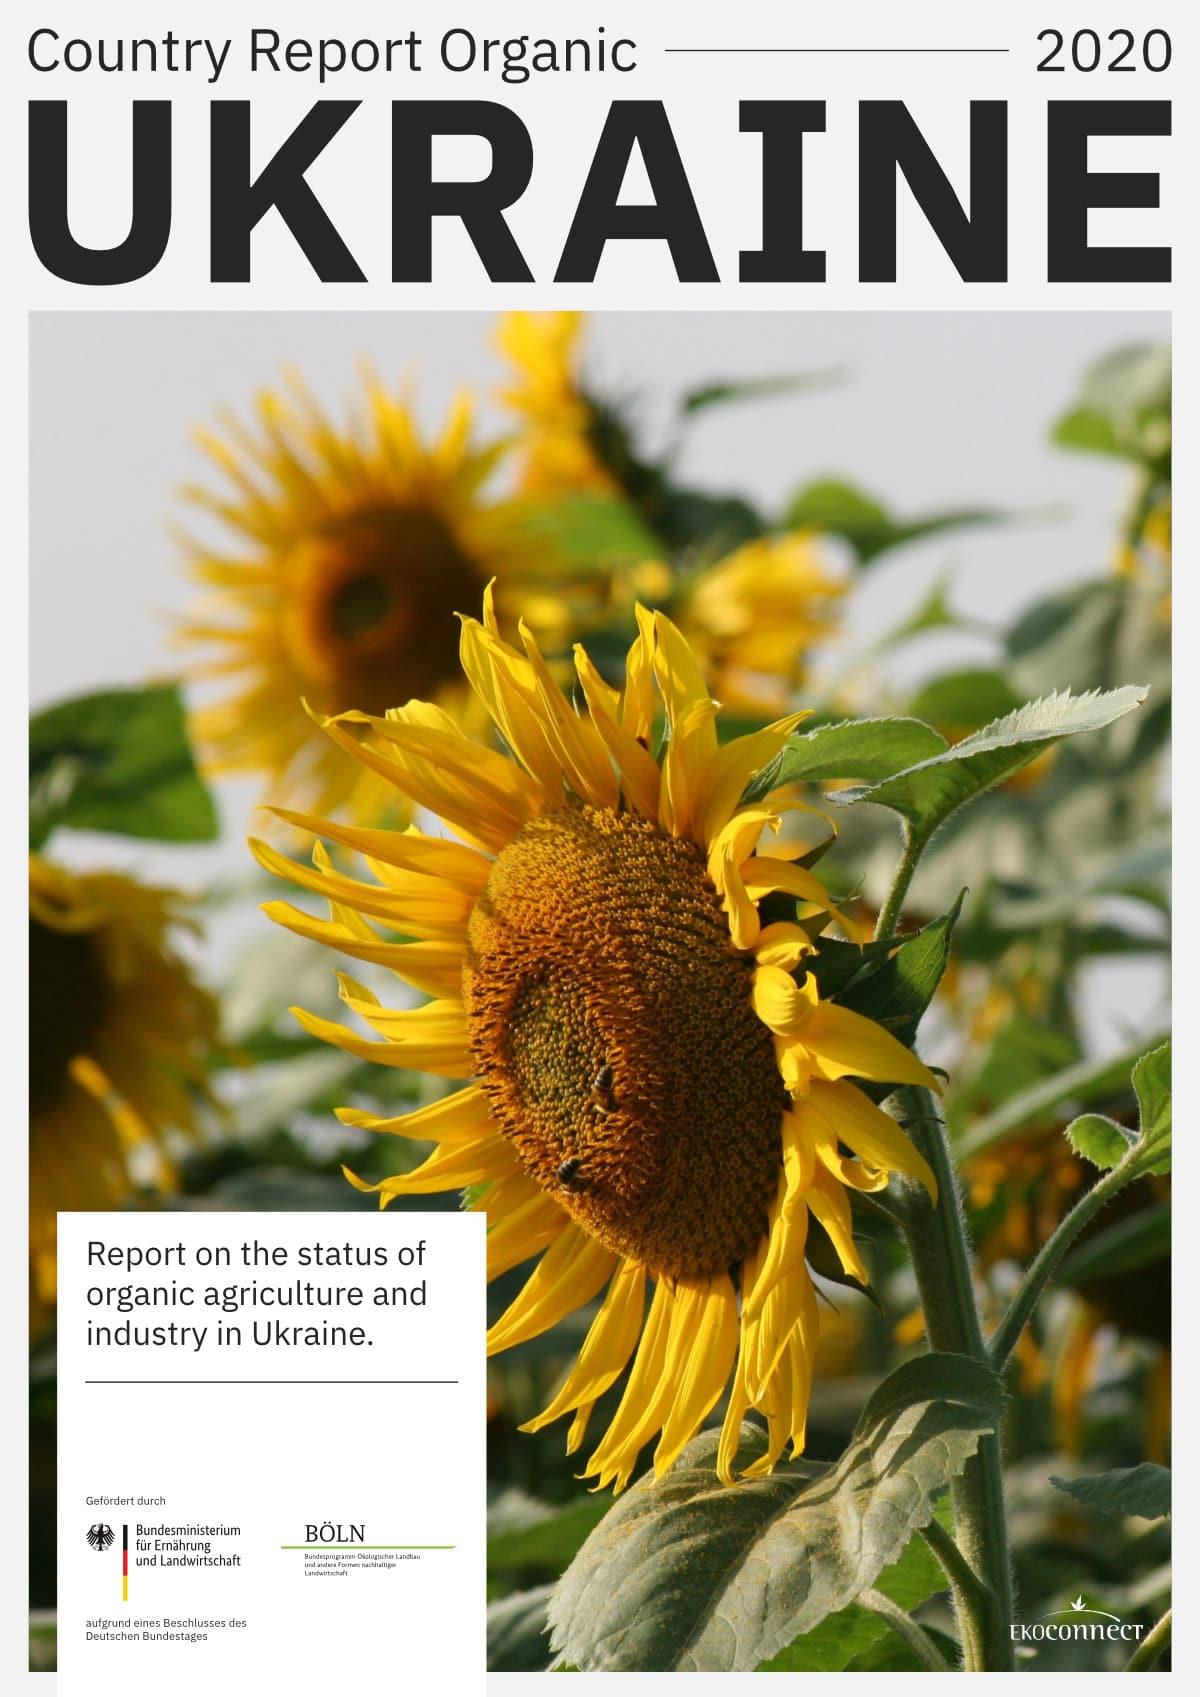 whateverworks-Country-Report-Organic-UKRAINE-EkoConnect-2021